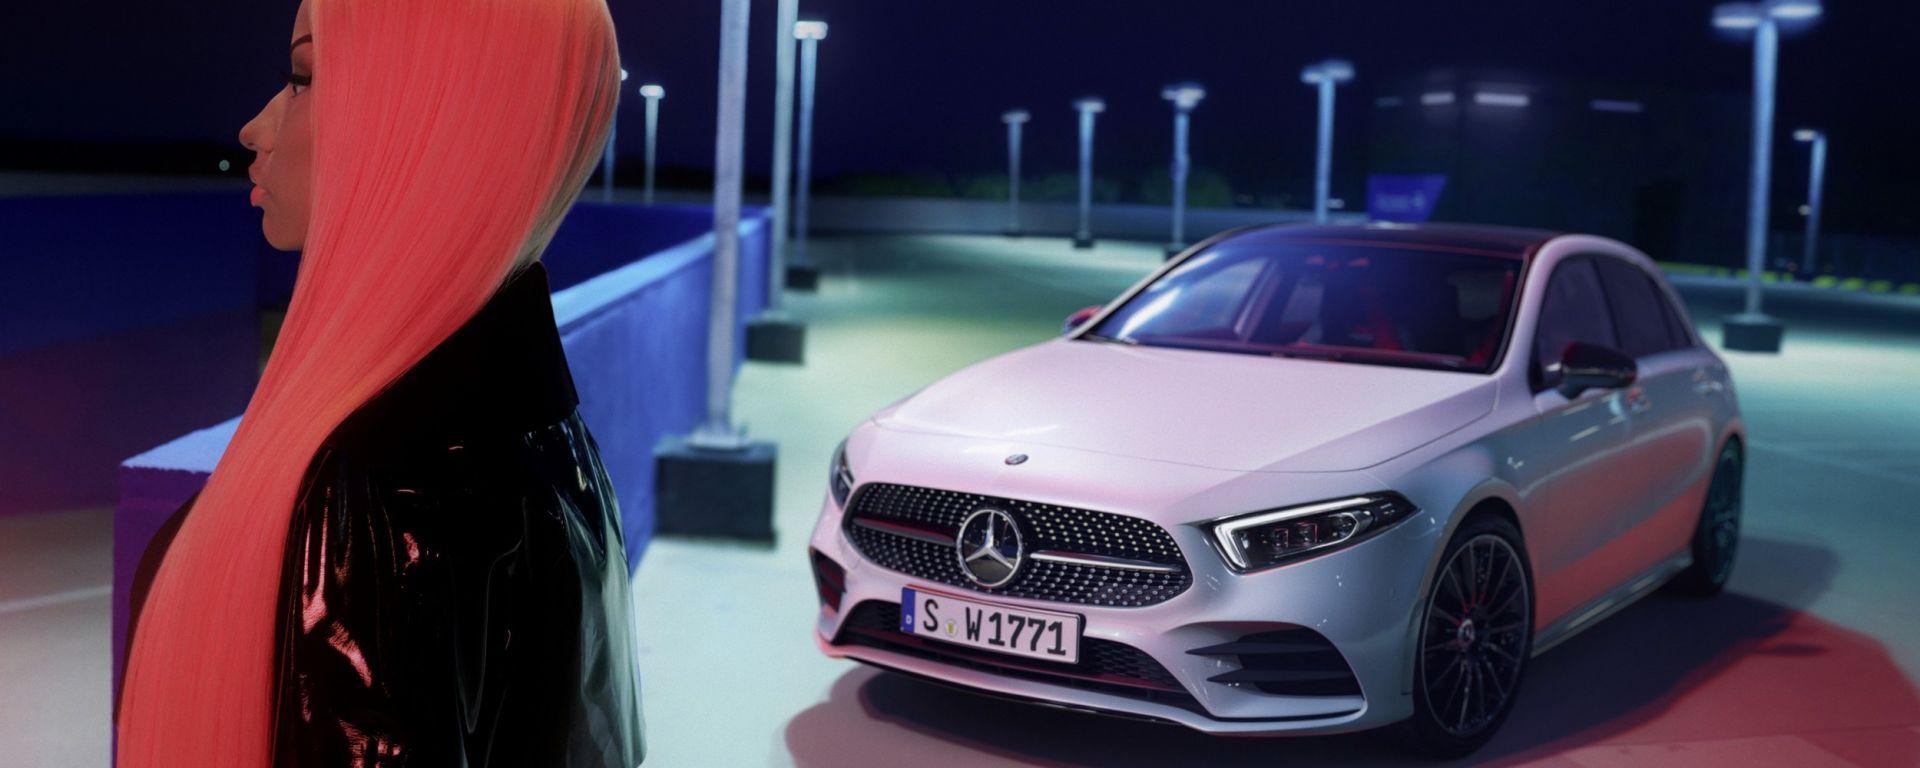 Mercedes Classe A 2018: lo spot con Nicki Minaj